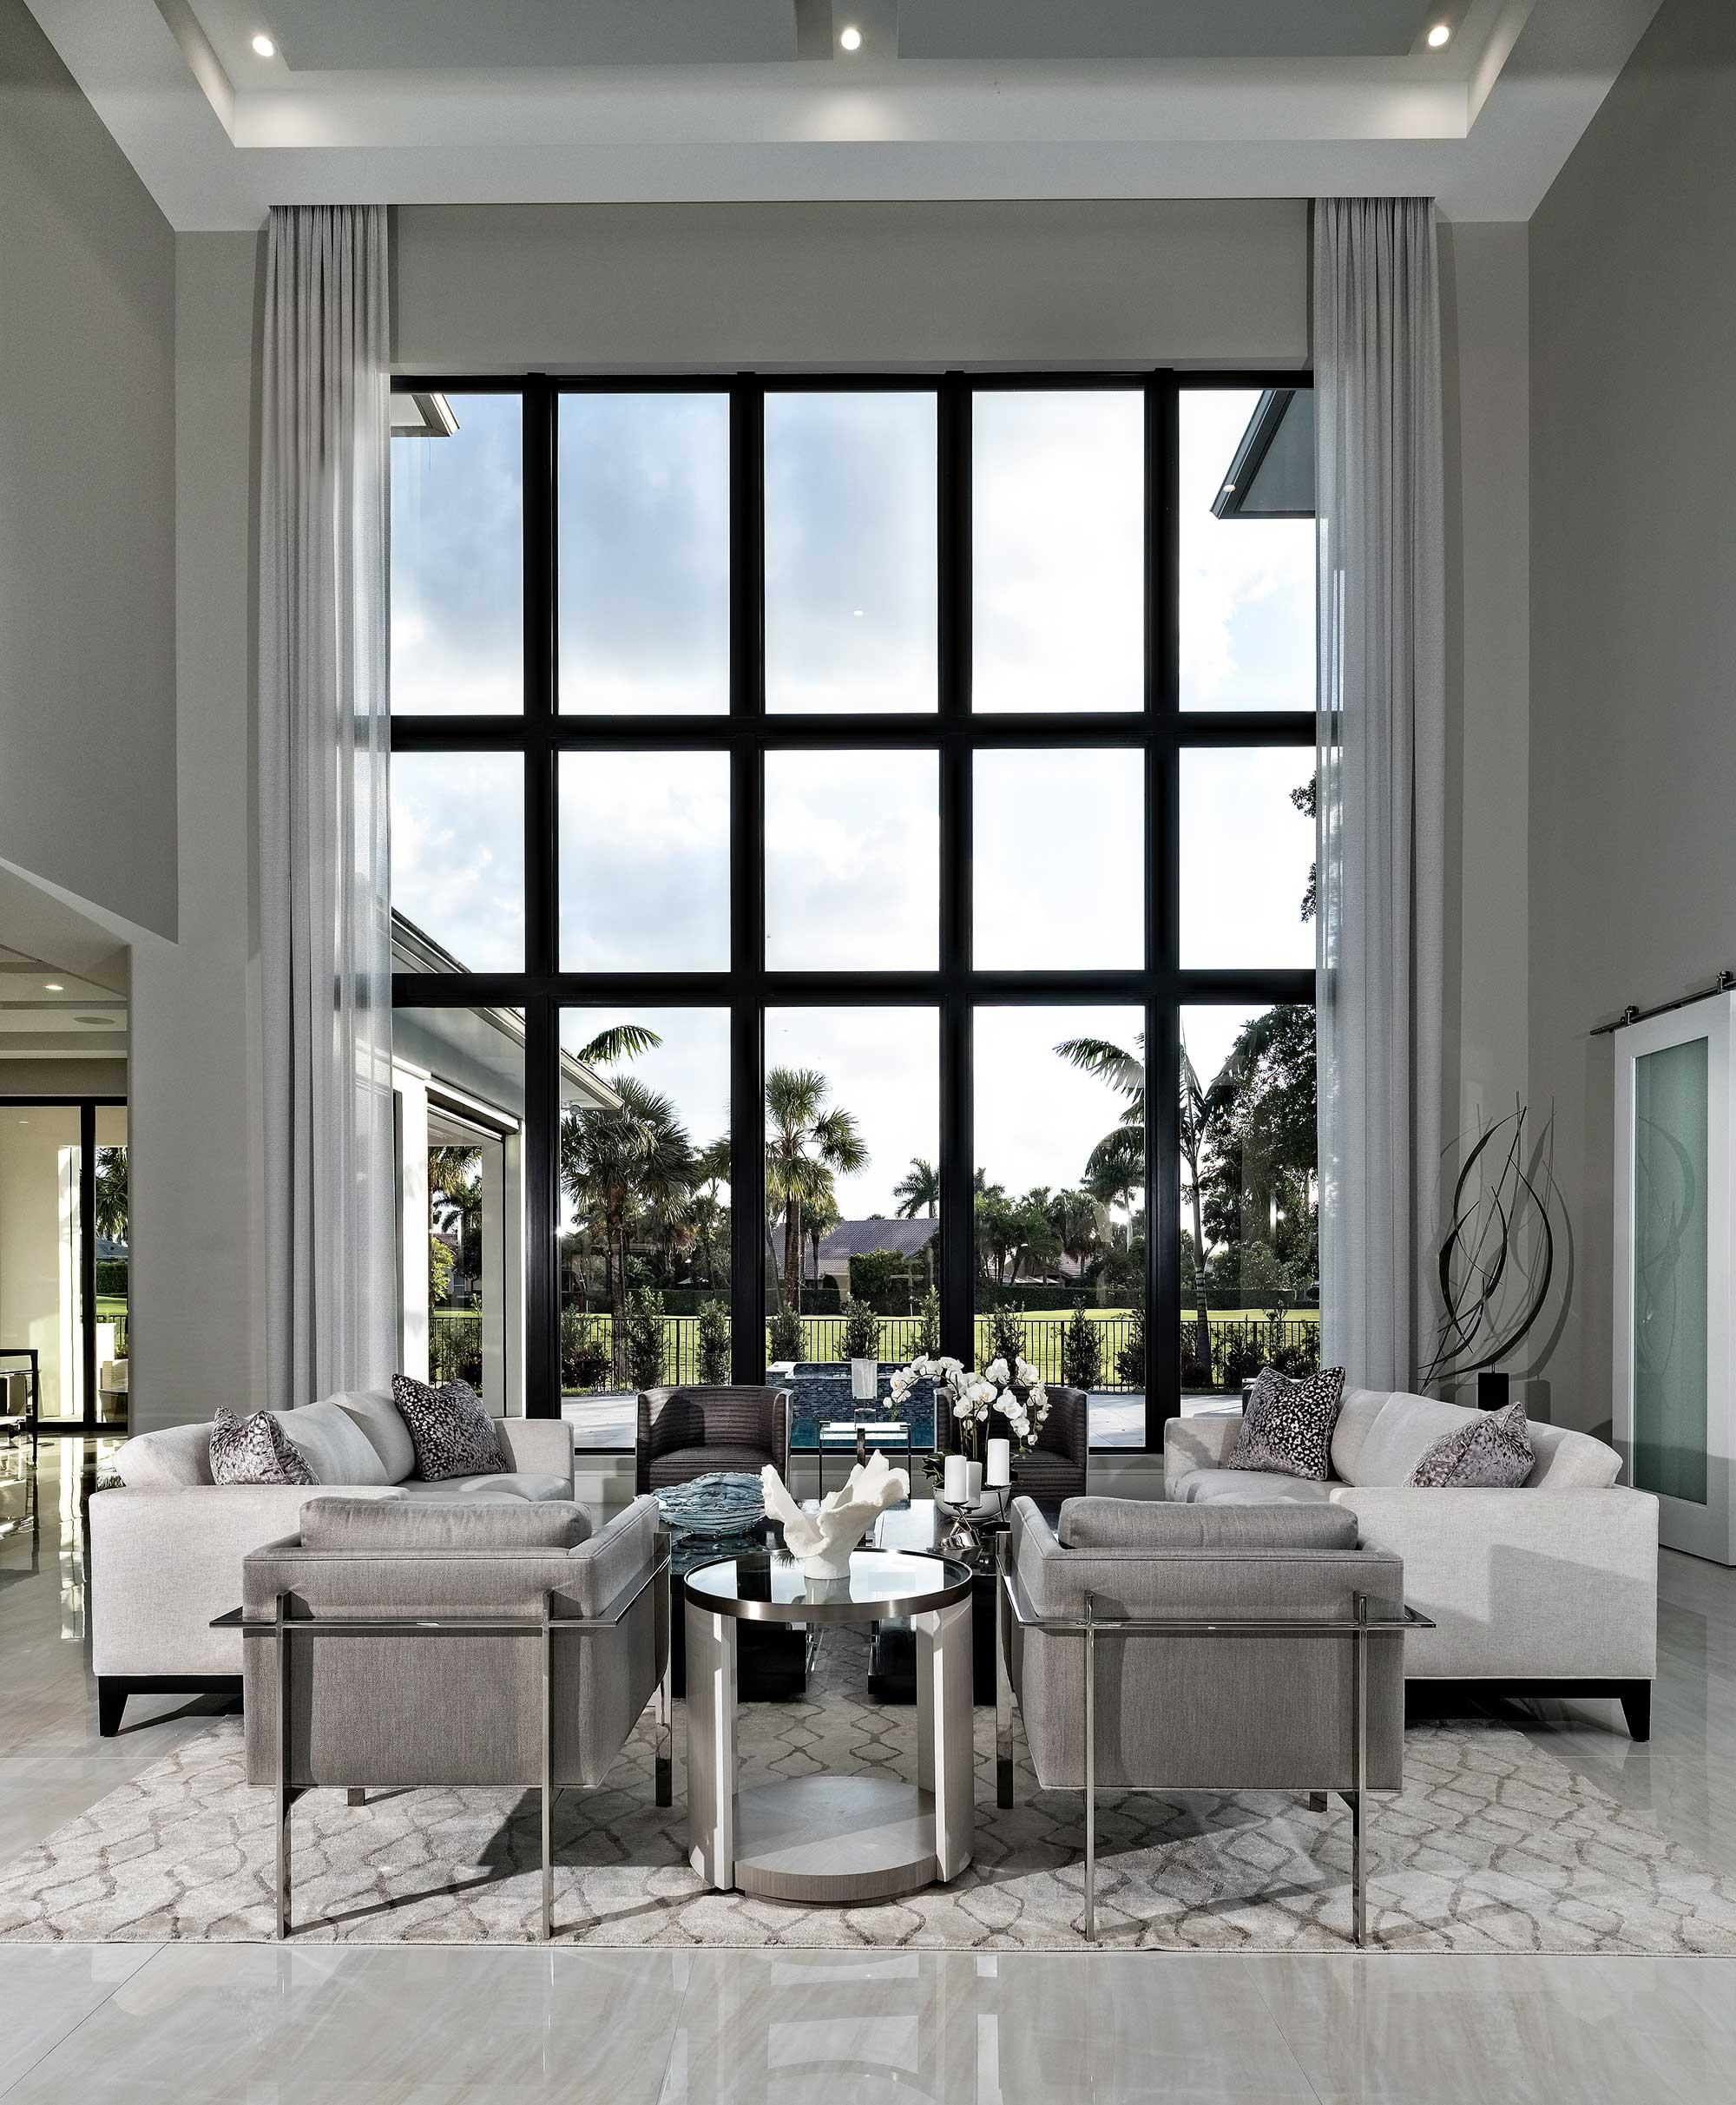 Fixed Windows custom glass in South Florida